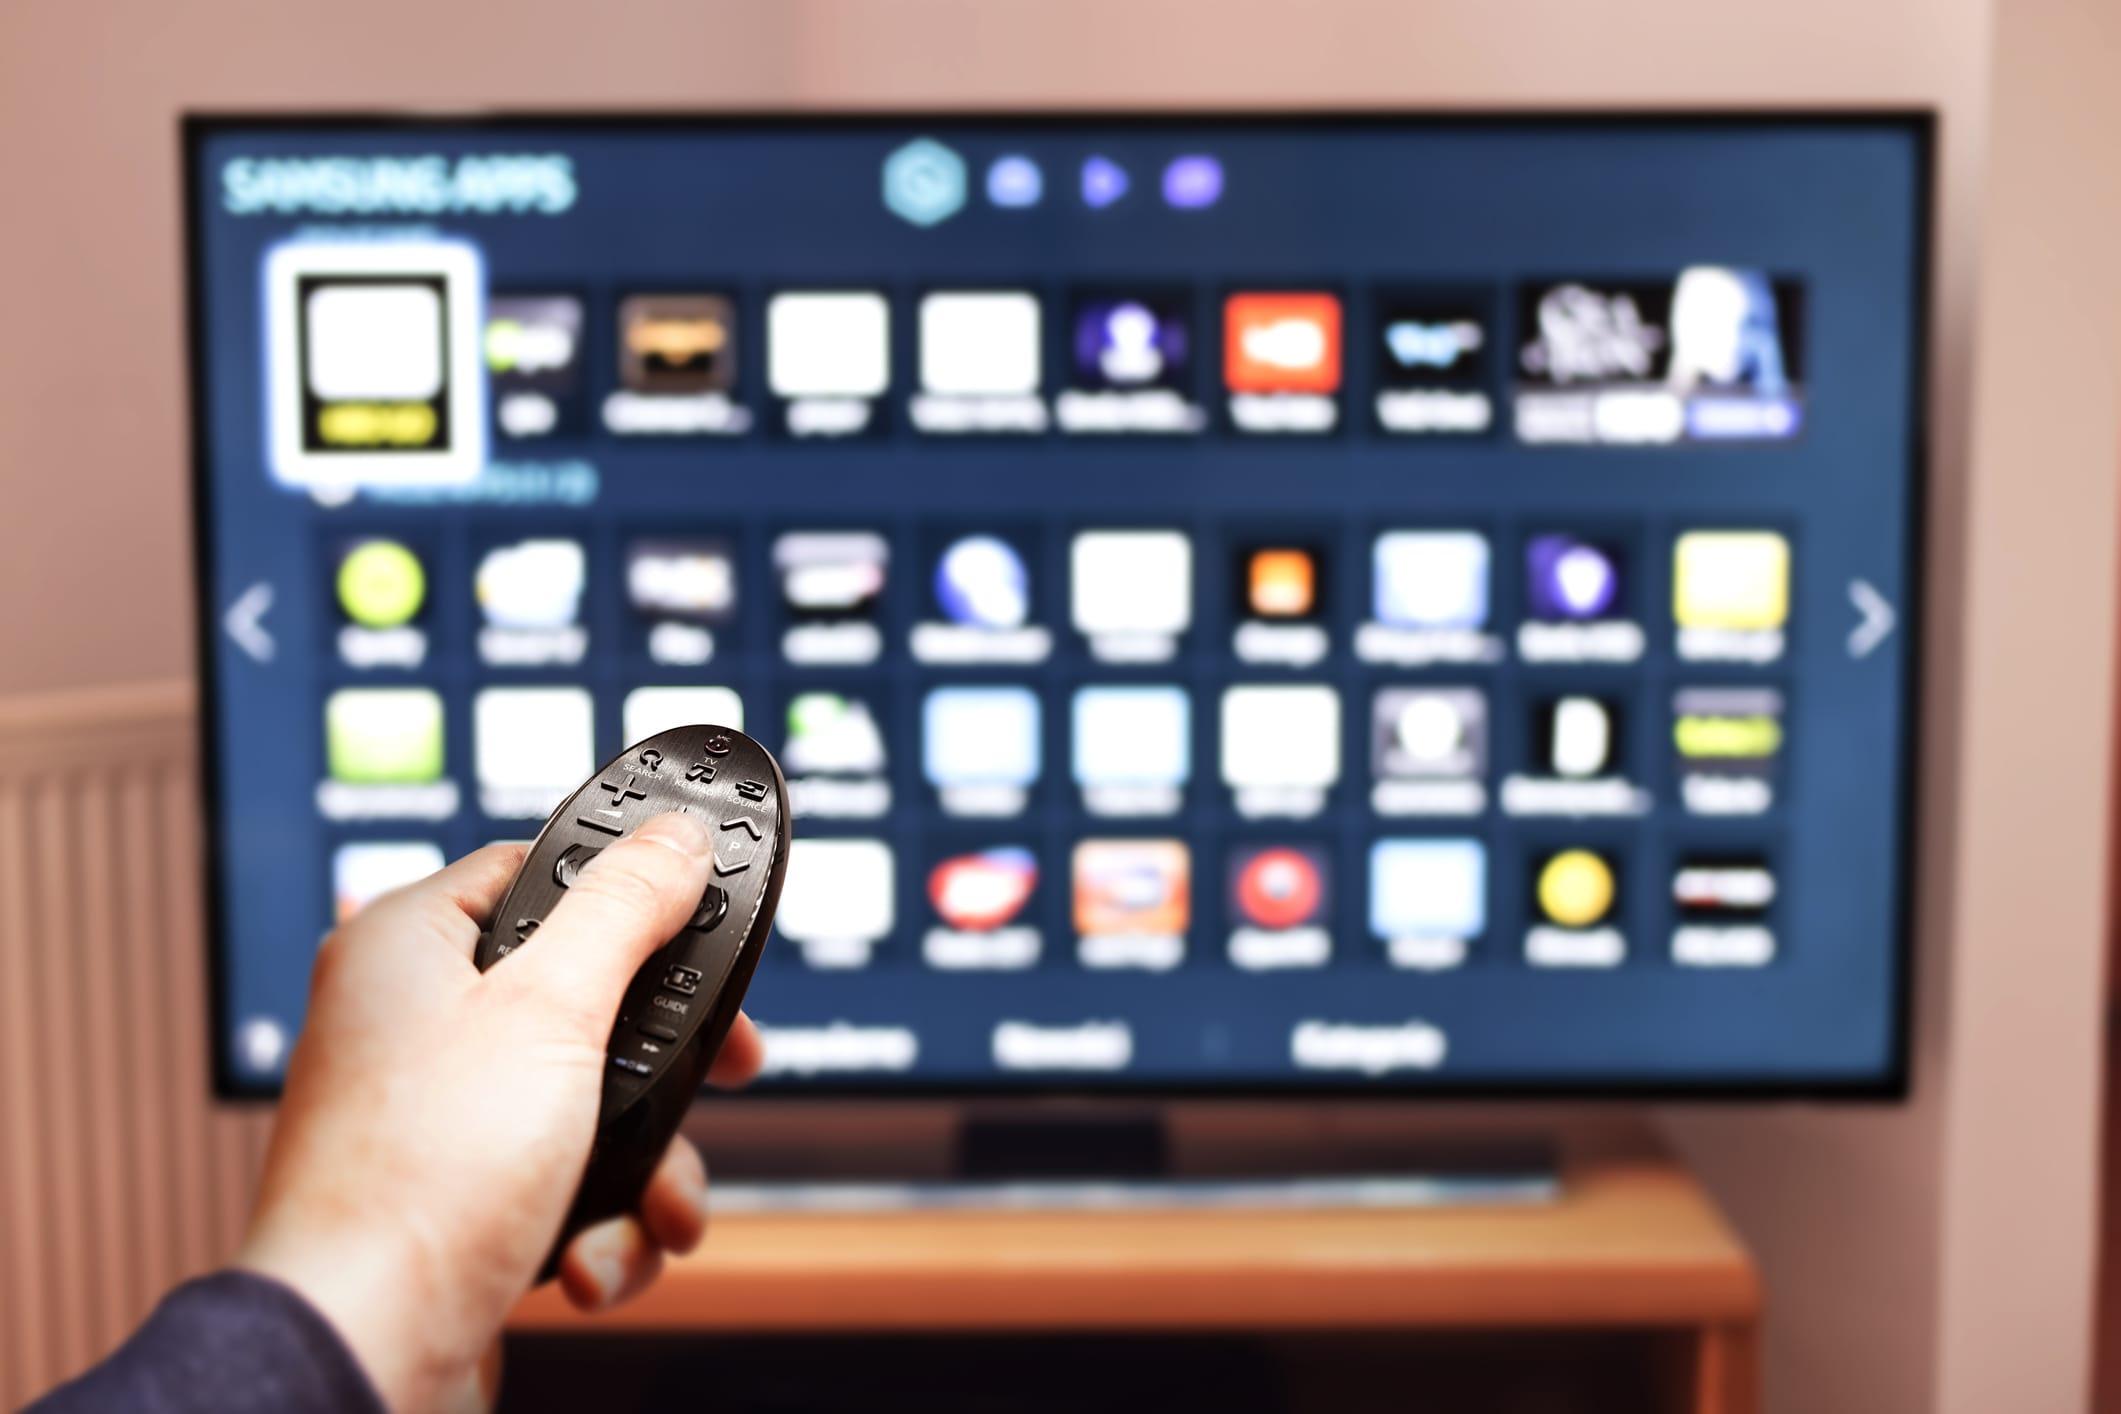 Do you need Smart TV Who has Smart TV